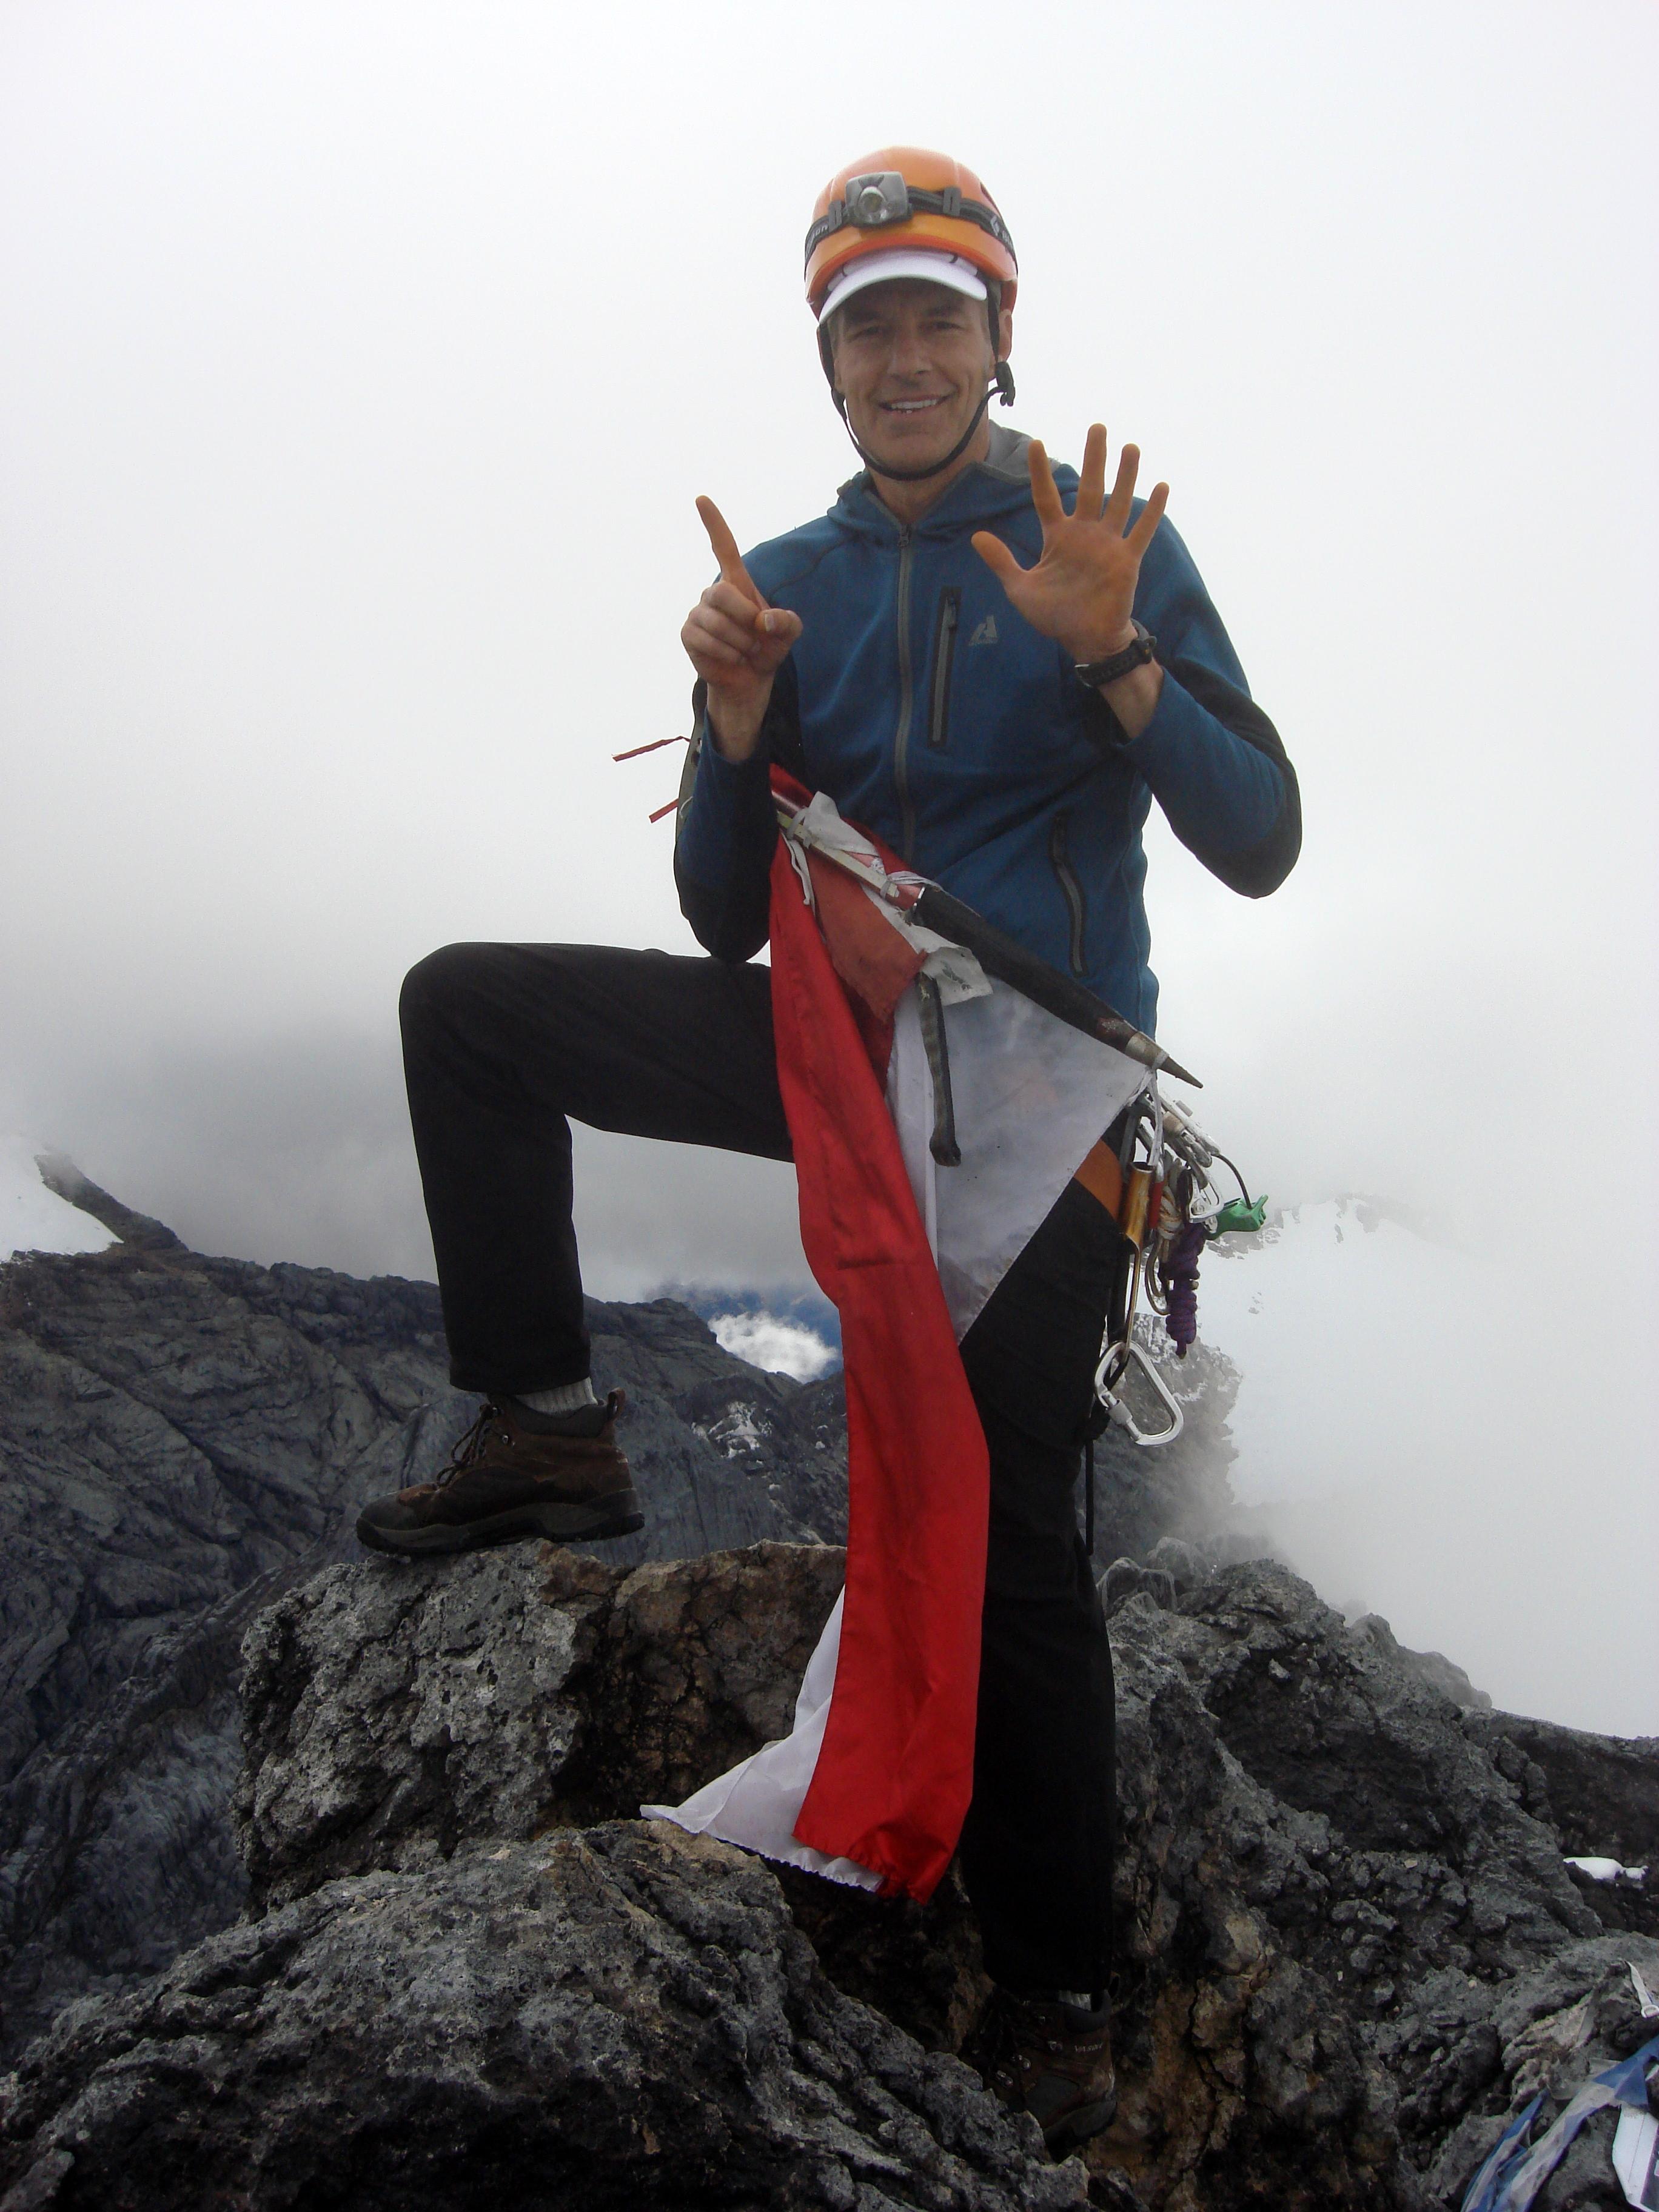 Martin Frey's travel adventures: 7 summits, 7 seas | CNN Travel